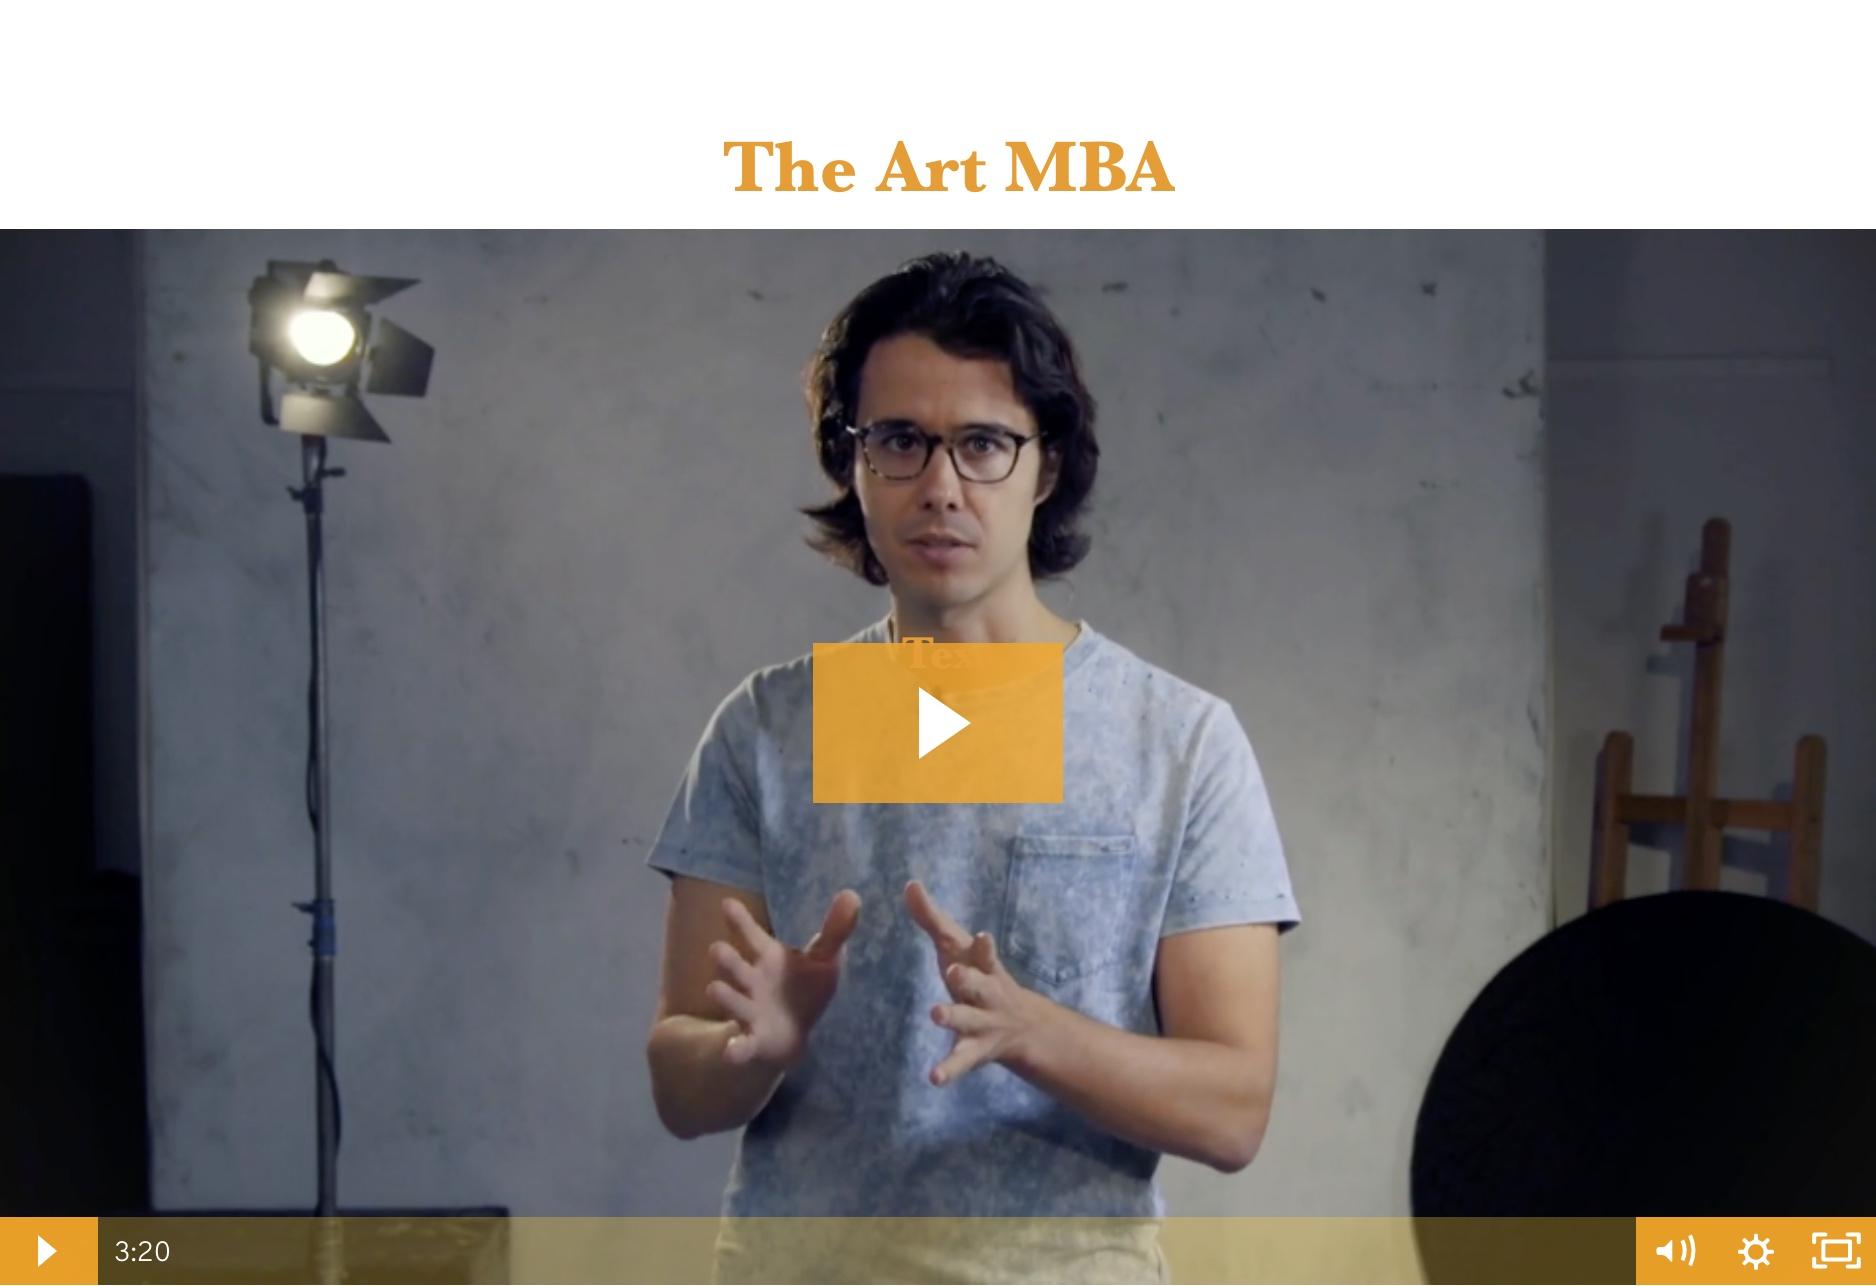 The Art MBA Theartmba.jpg